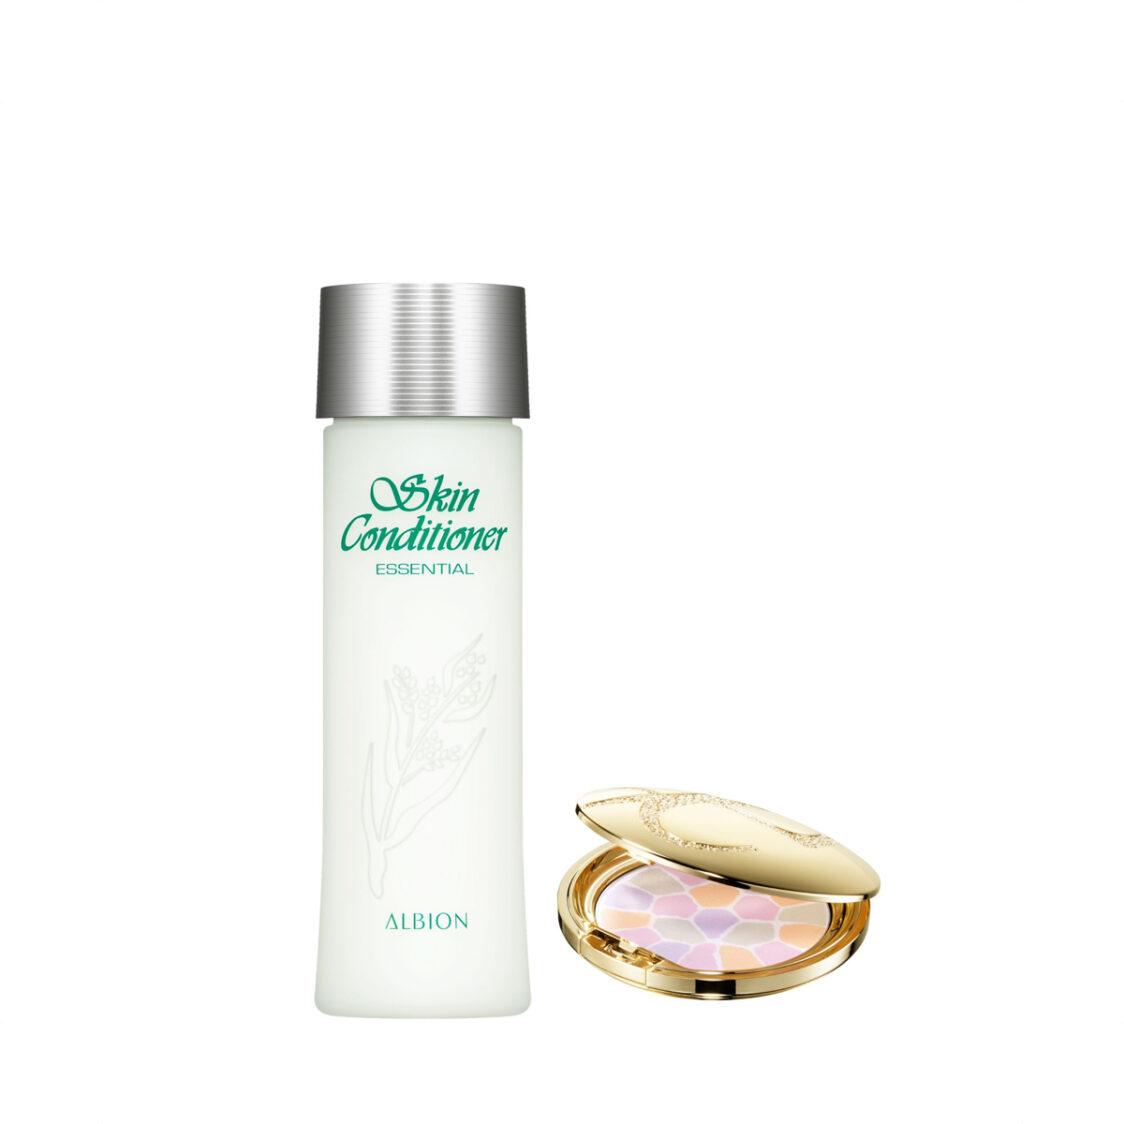 ALBION Elgance Pressed Powder 88g  Skin Conditioner Essential 330ml Set